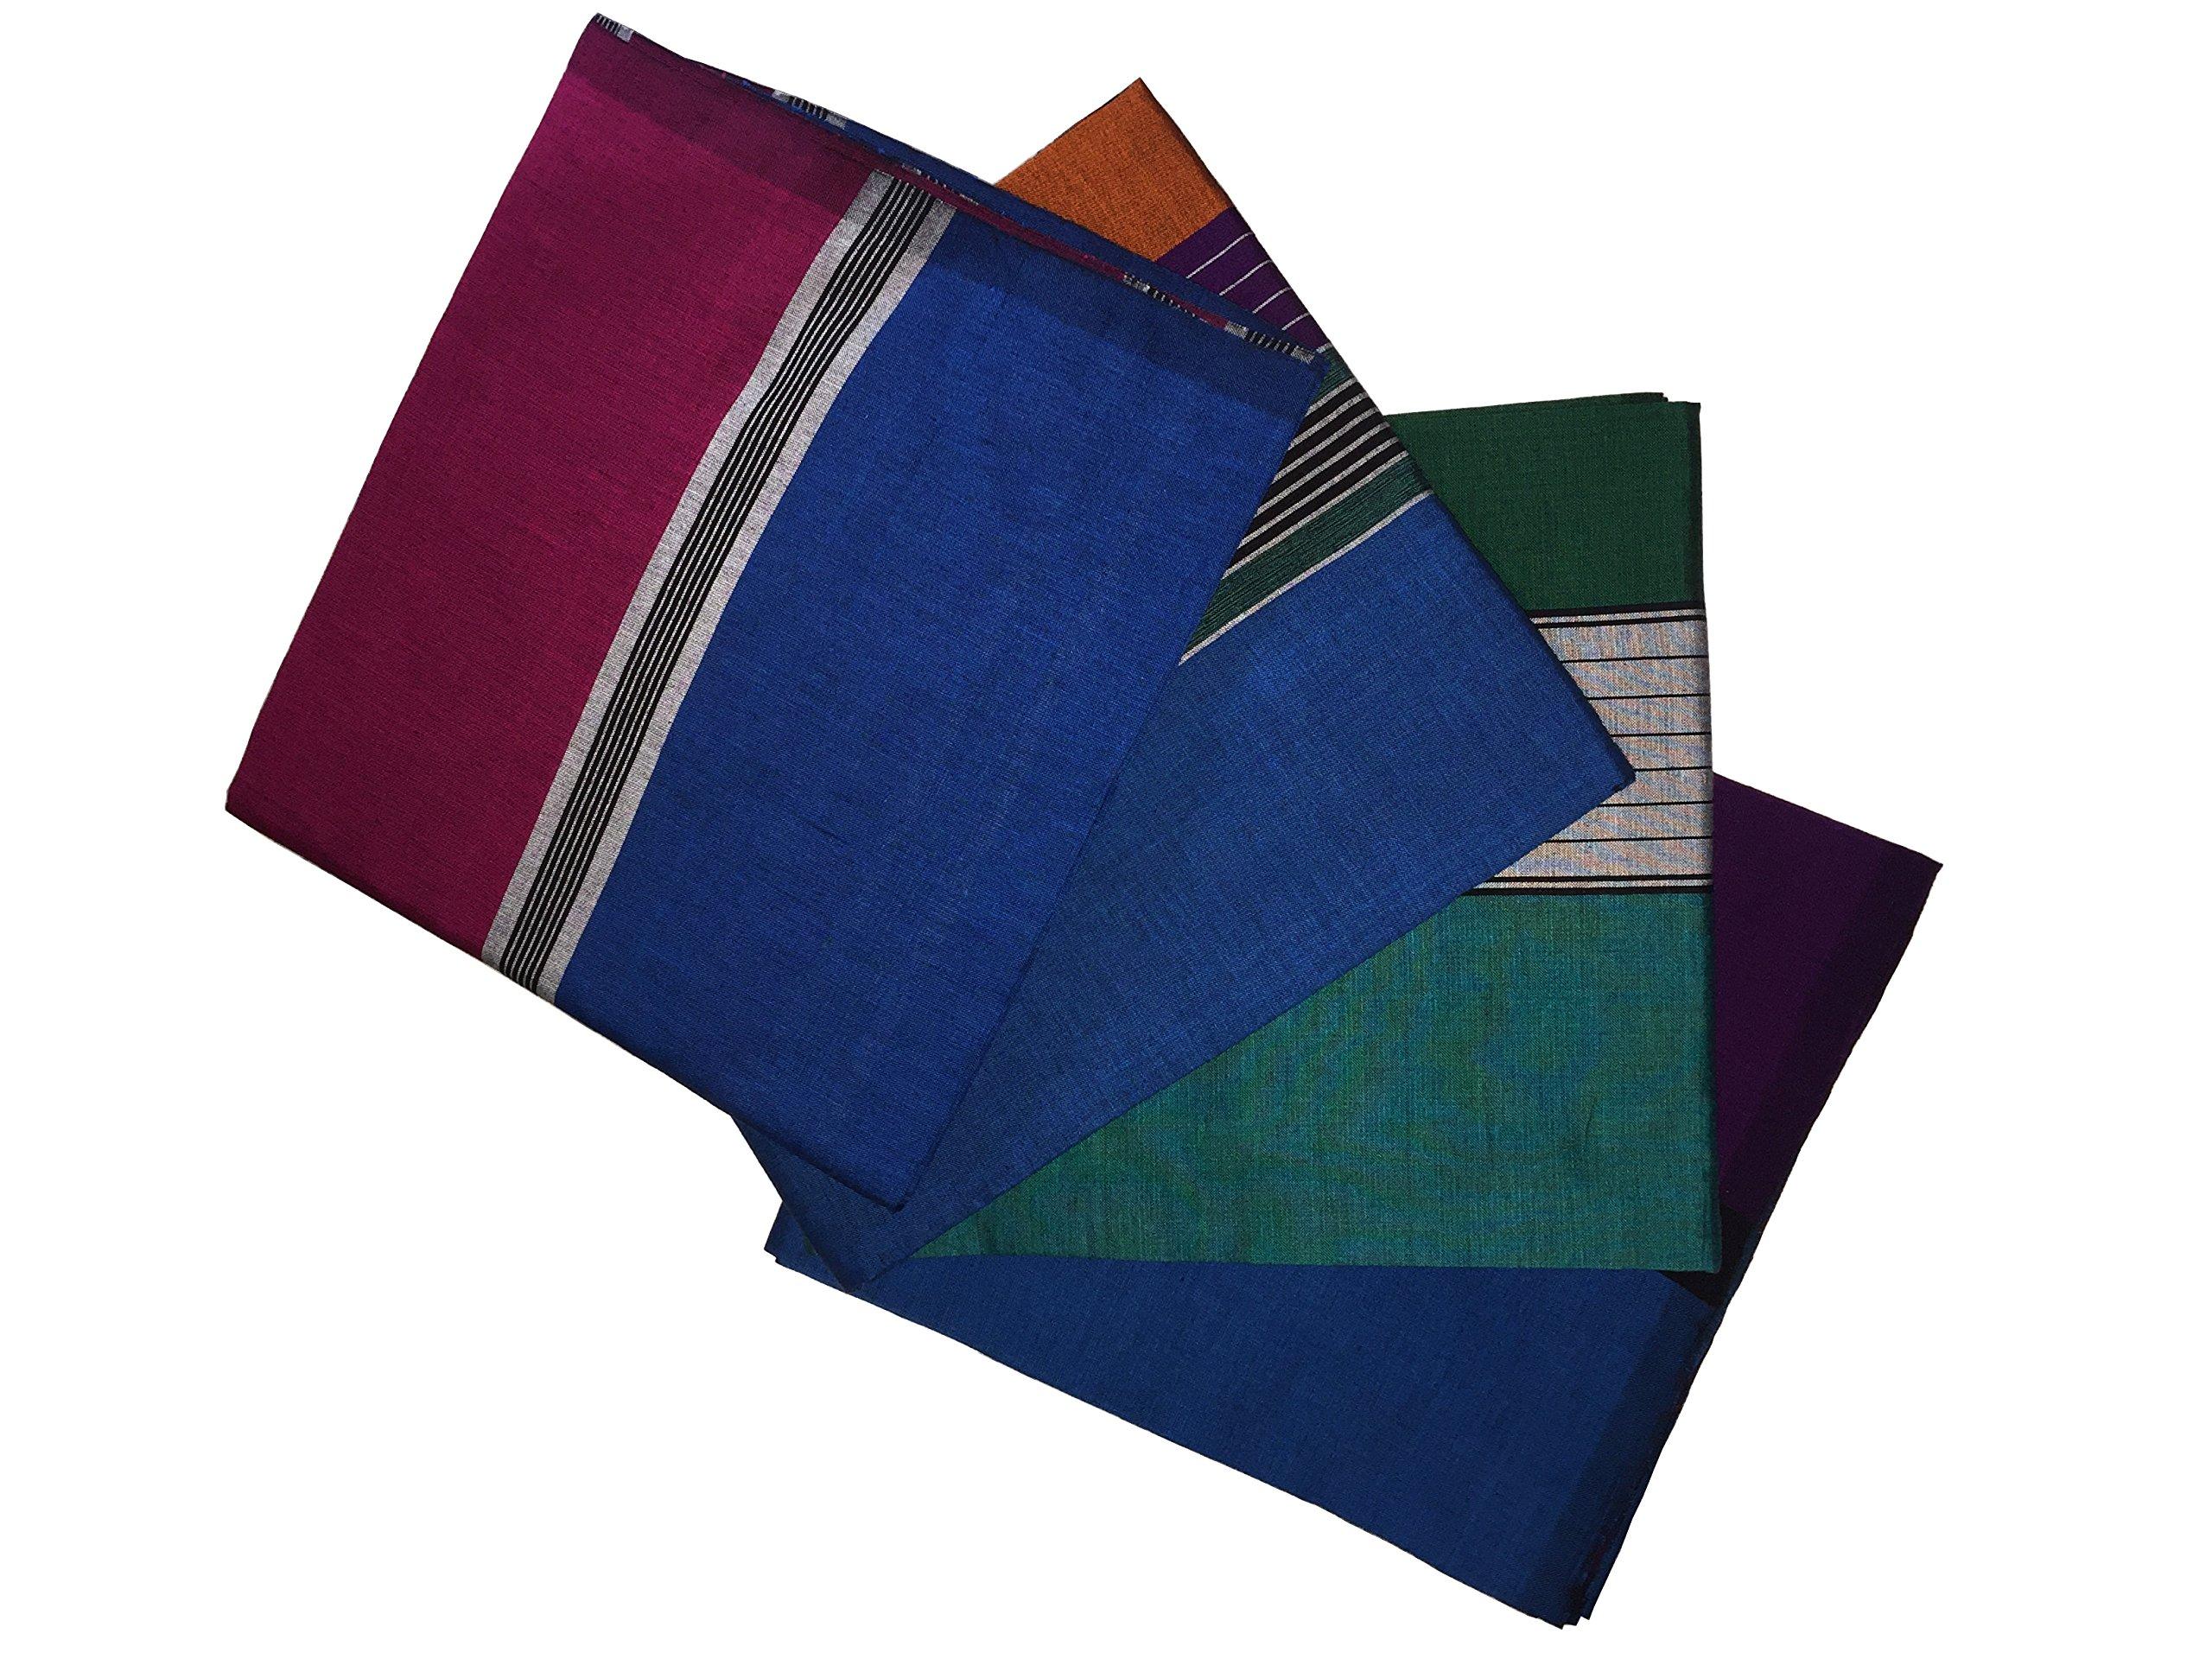 ReenaHANDS Lungi Sarong Mens Handloom Lungi Sarong 100% Cotton. Stitched Tube Sarong. Assorted Color/Design by ReenaHANDS (Image #1)